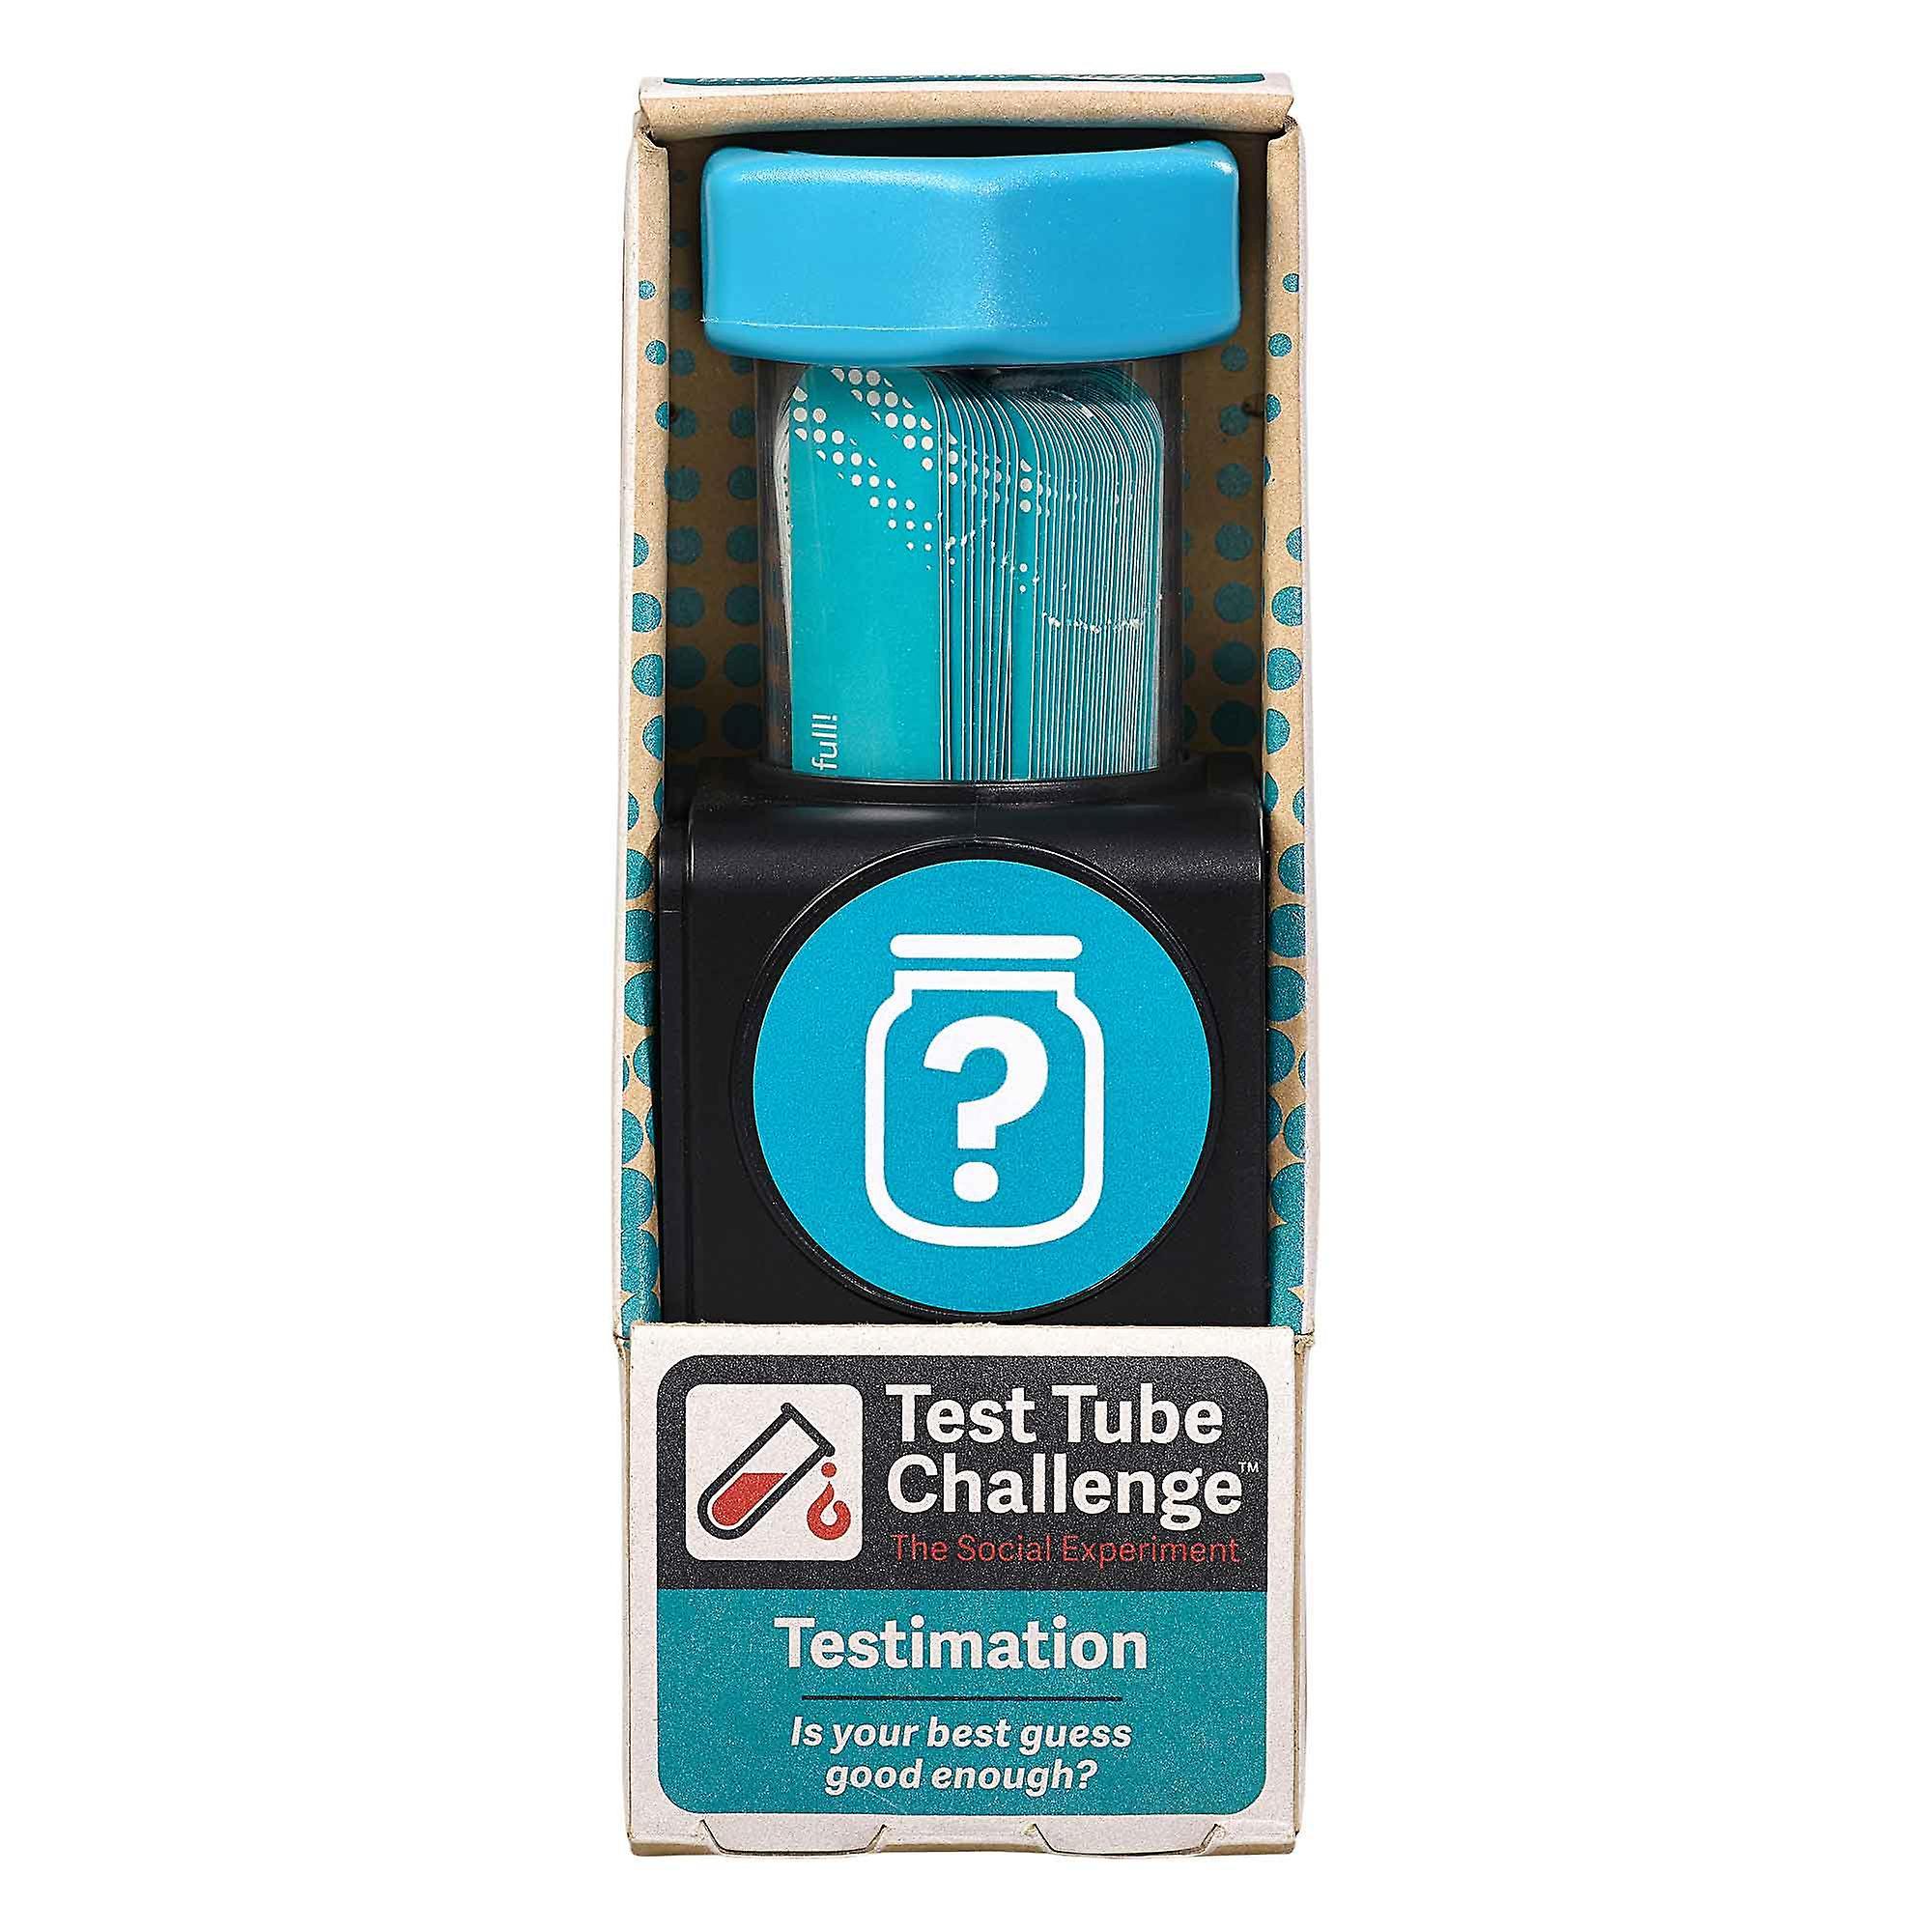 Testimation Booster Pack - Ridleys Test Tube Challenge